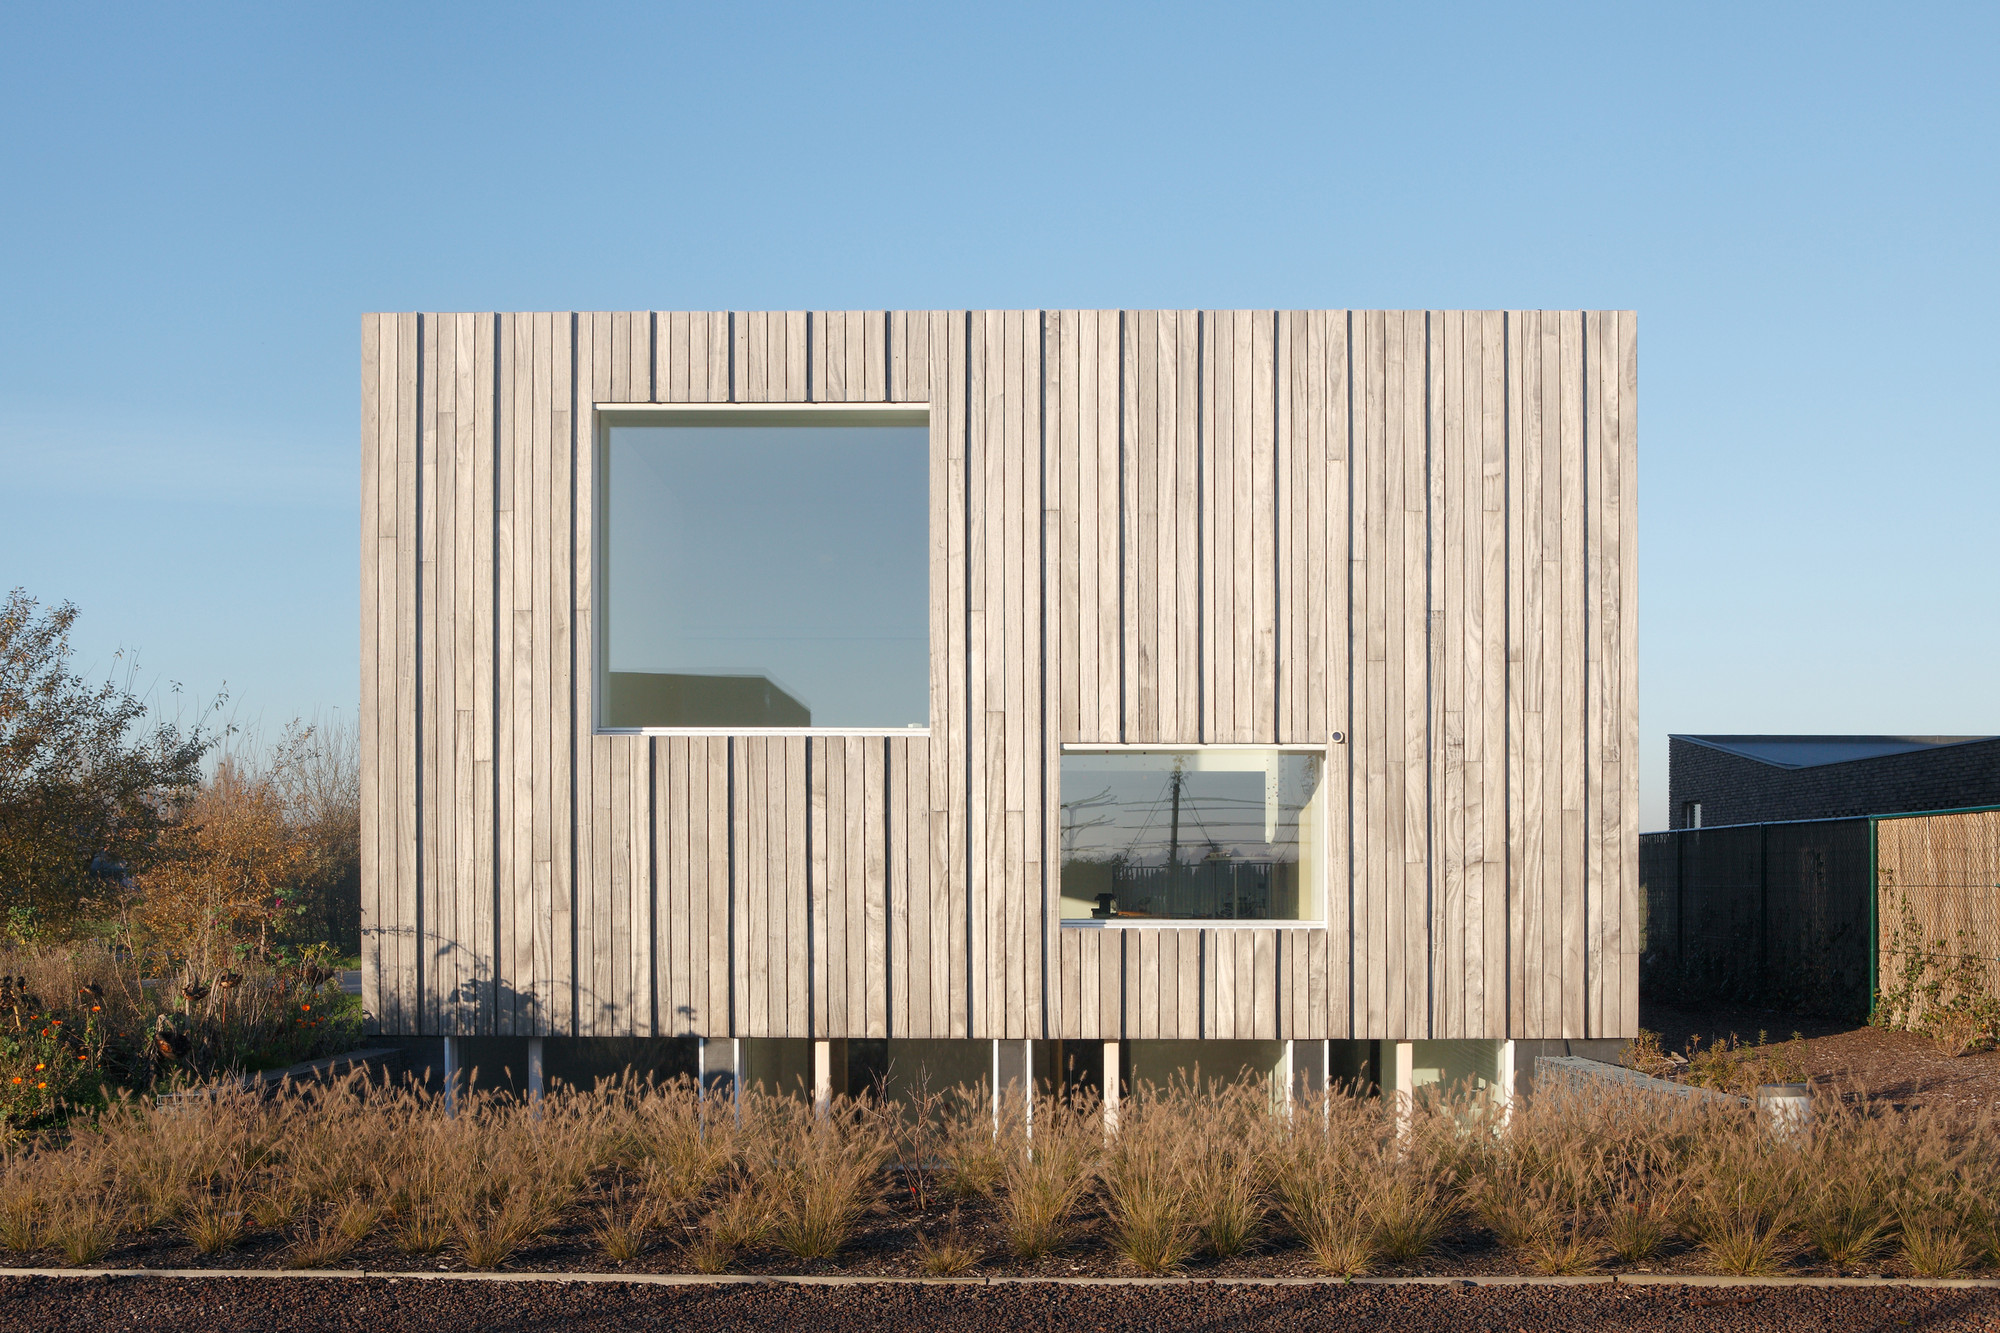 Gallery of zero energy house lokeren blaf architecten 11 Zero energy homes